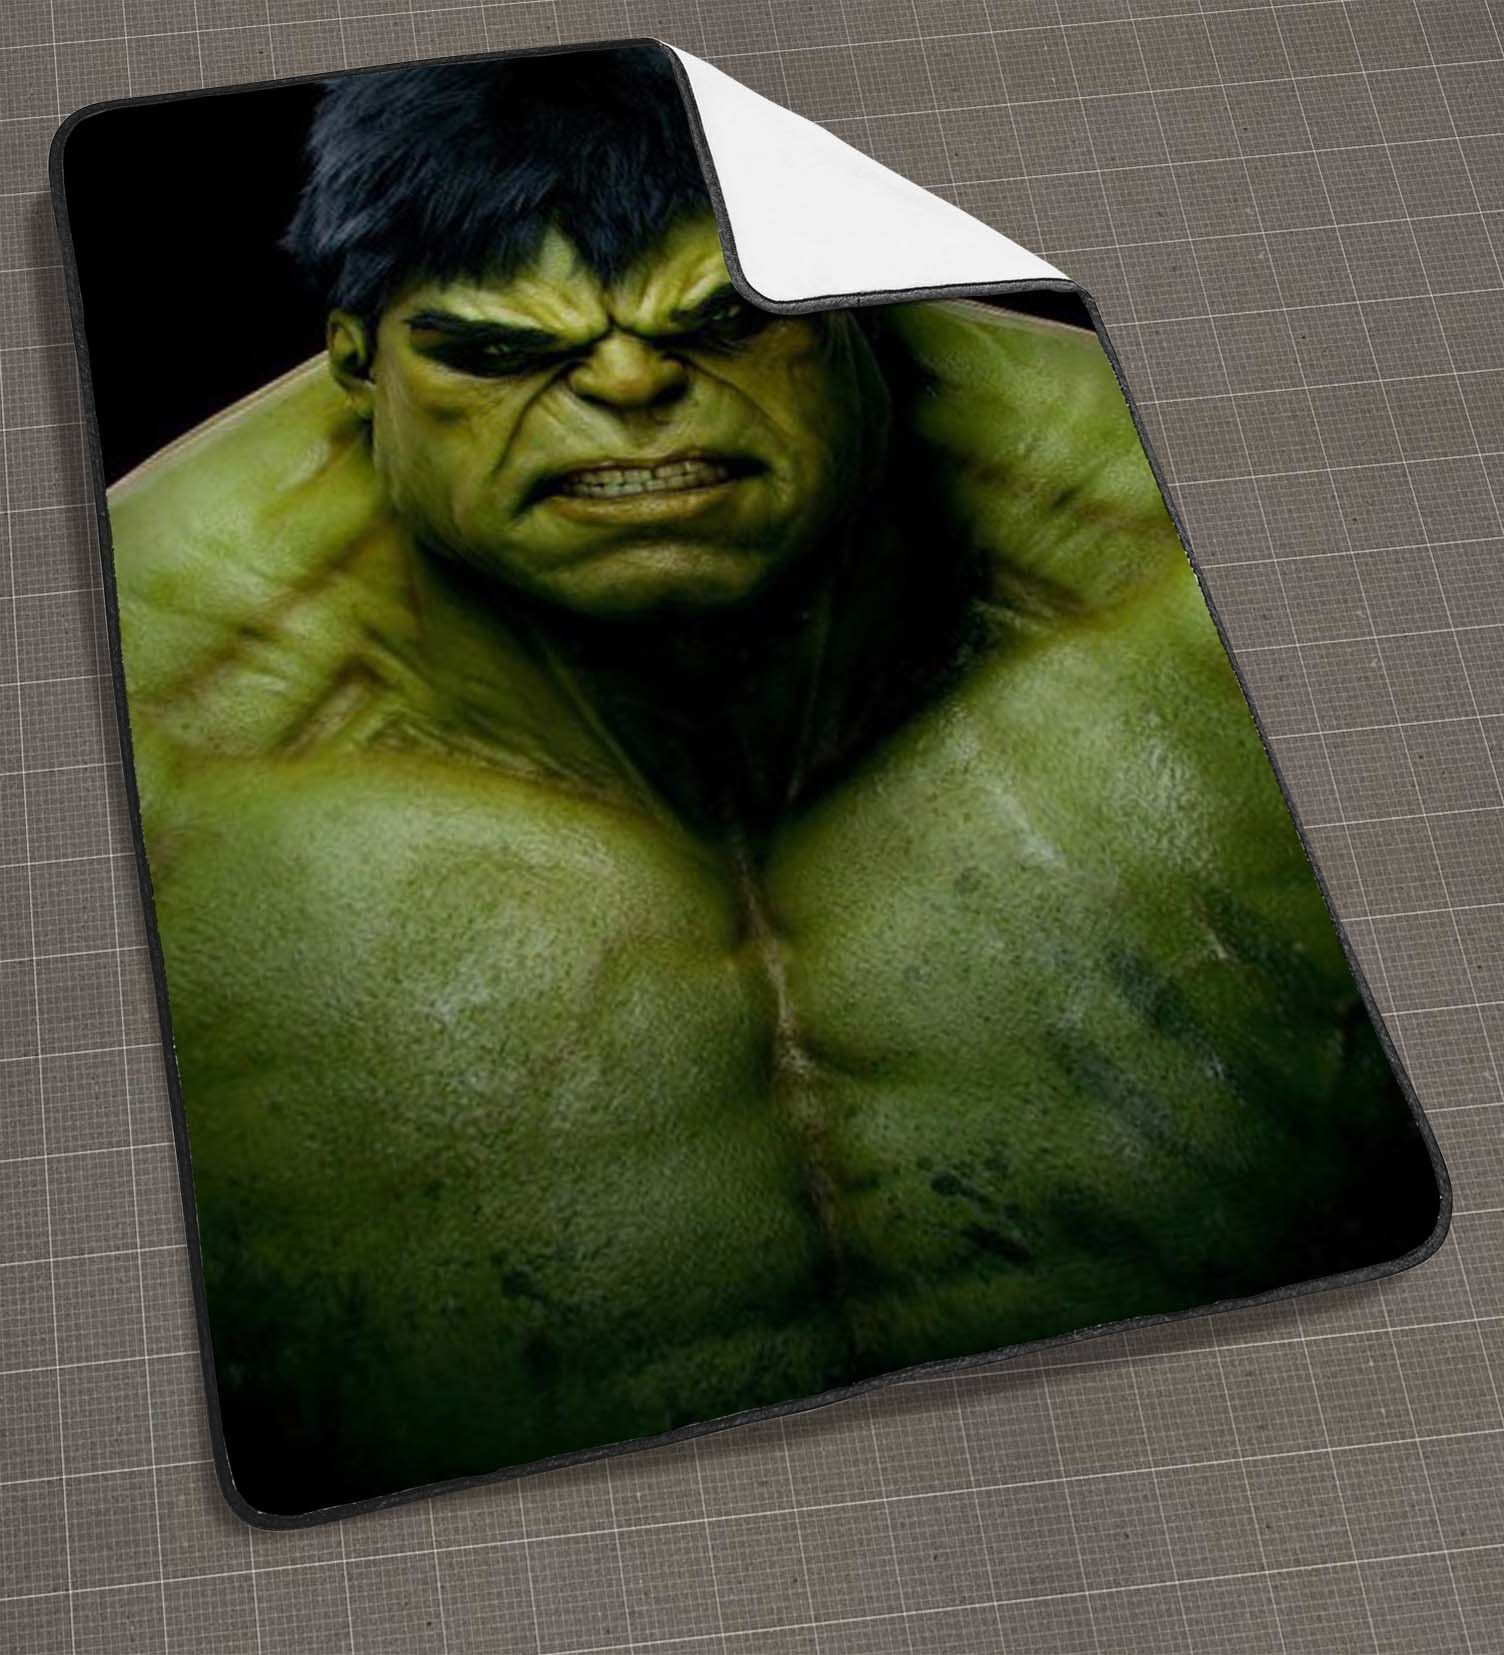 Incredible Hulk blanket, funny blanket, cute and awesome blanket ...